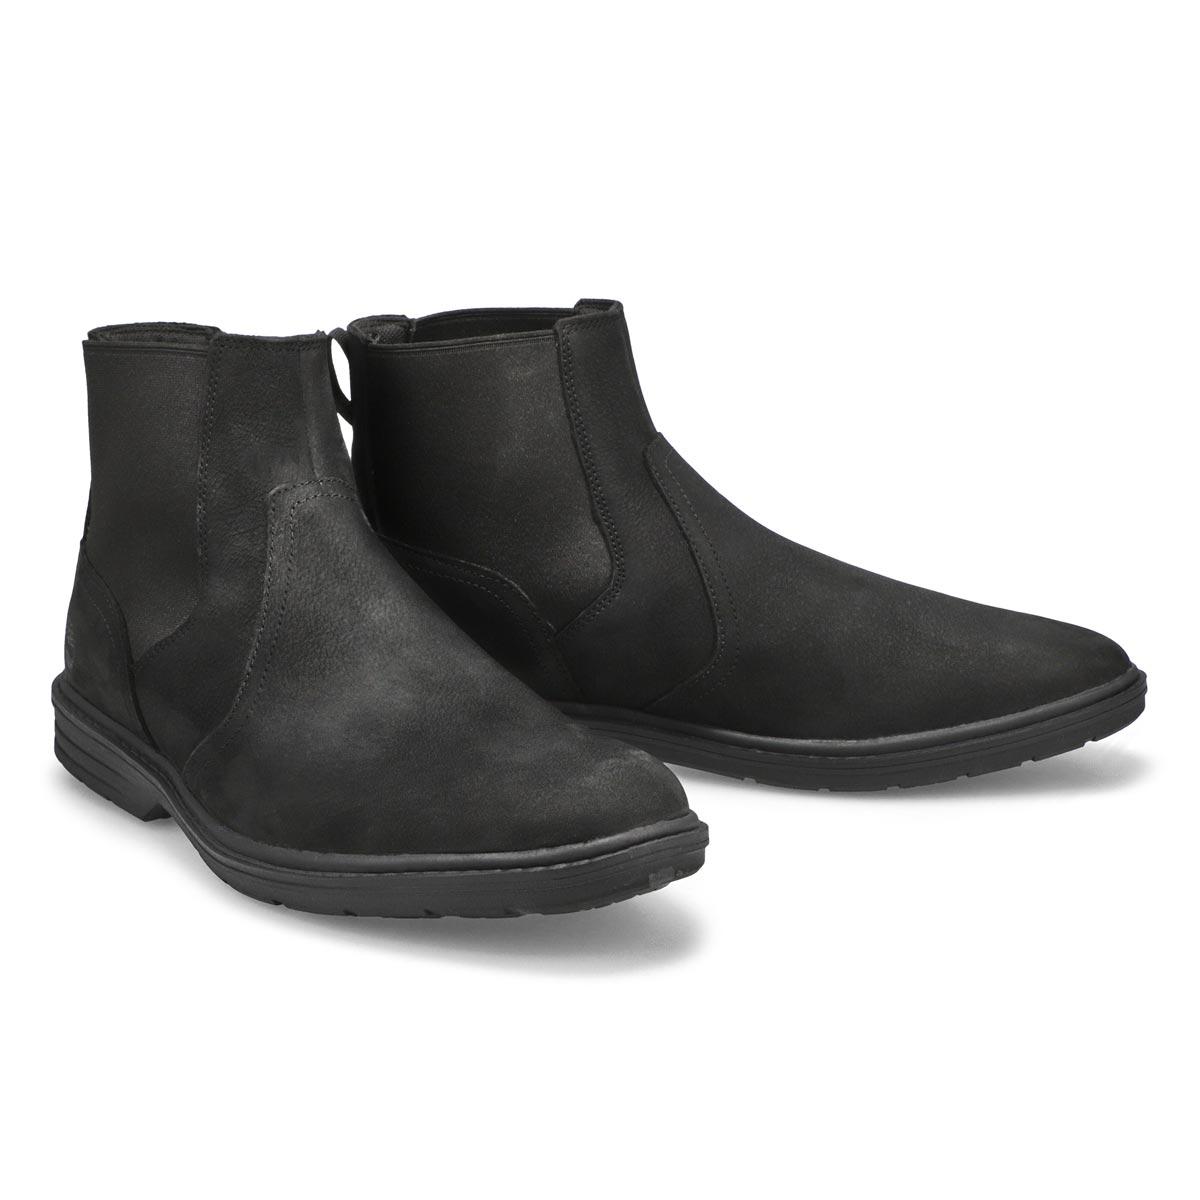 Men's Sawyer Lane Chelsea Boot - Black